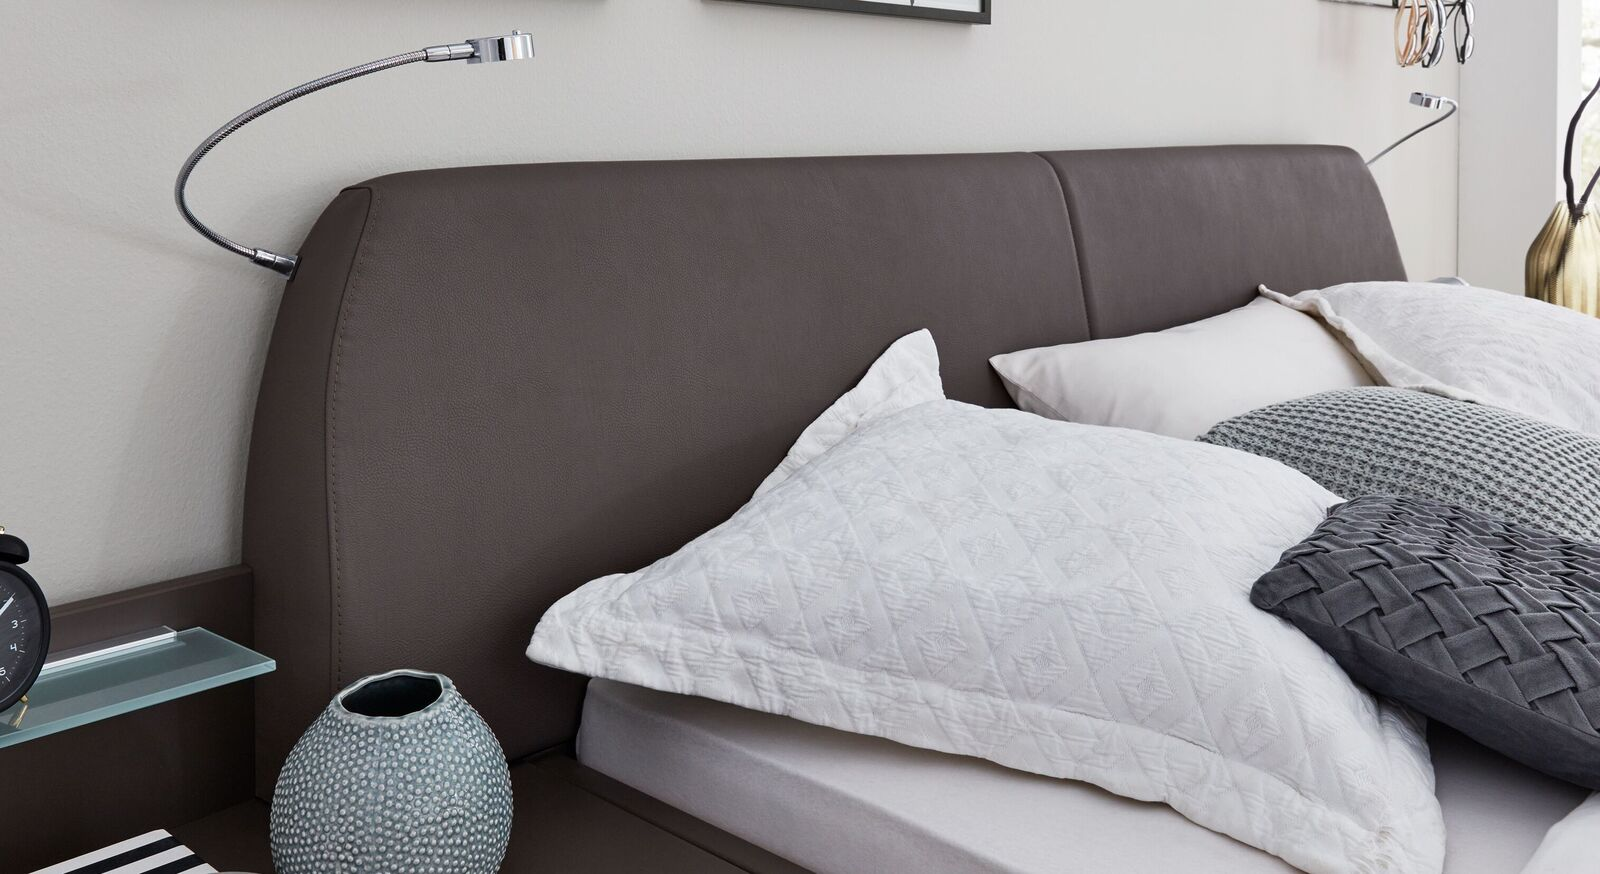 INTERLIVING Bett 1006 mit Kunstlederbezug am Kopfteil